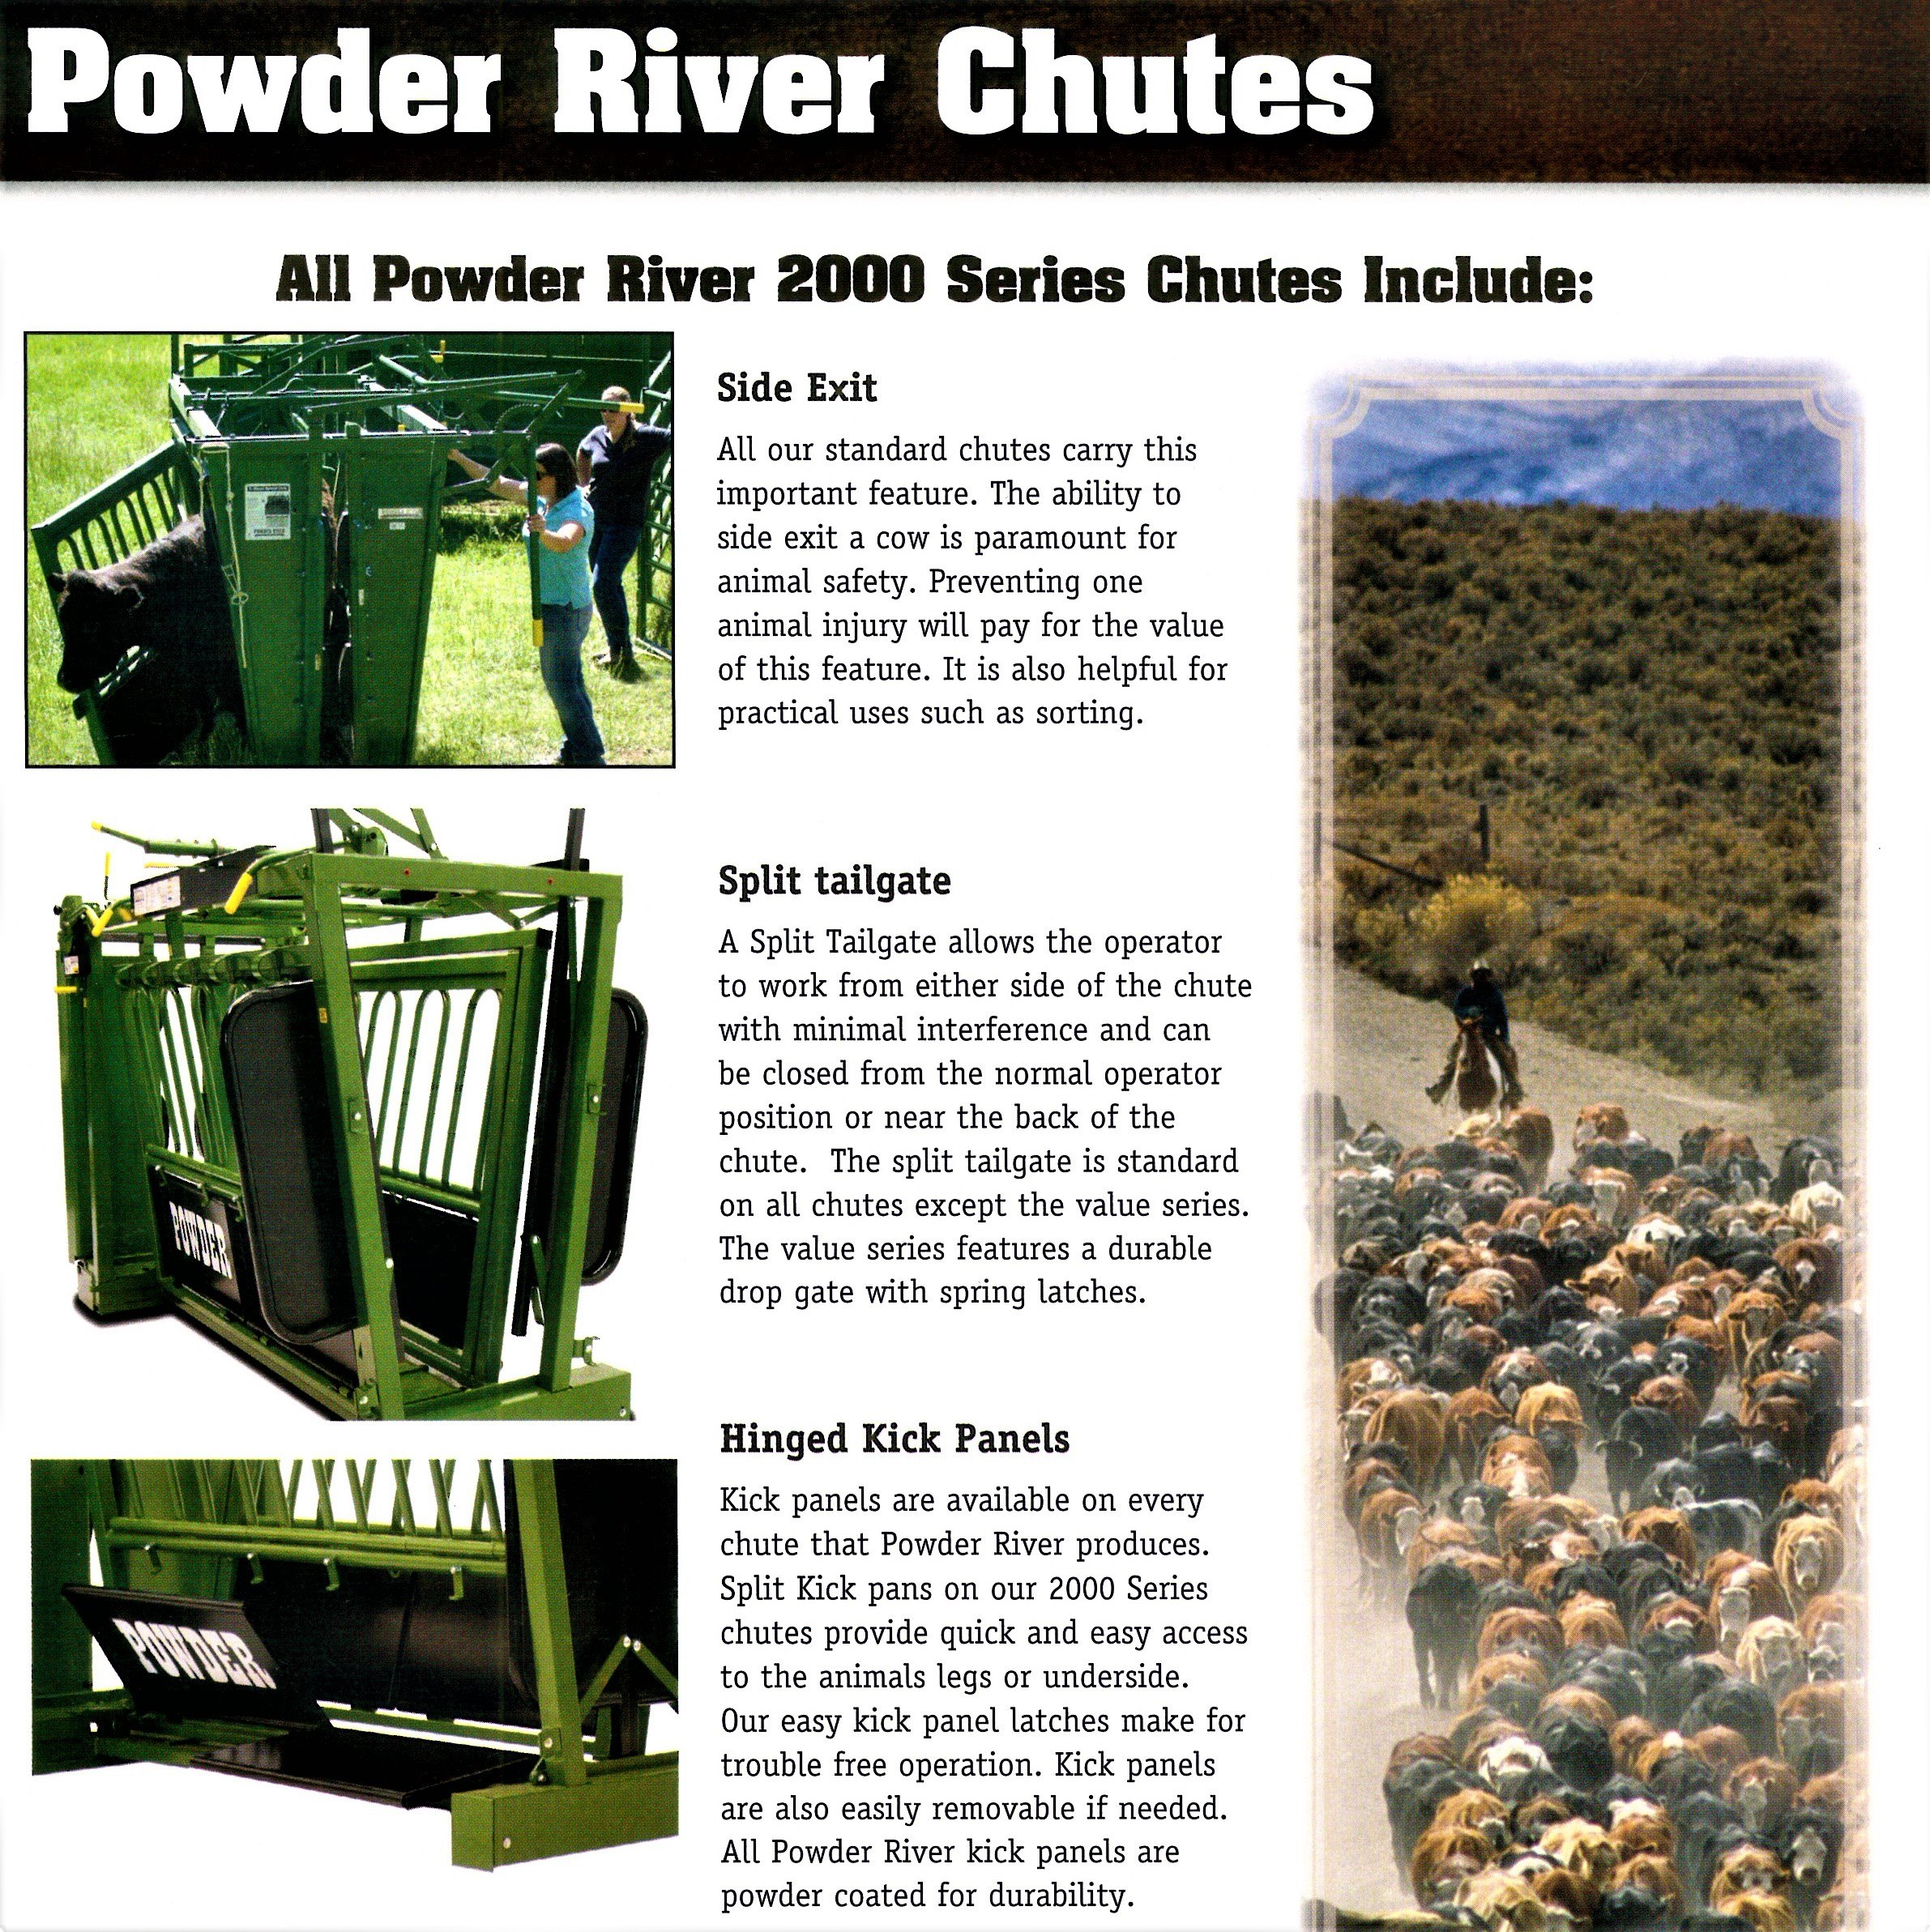 august-2020-powder-river-chutes-2000-series-include-....jpg